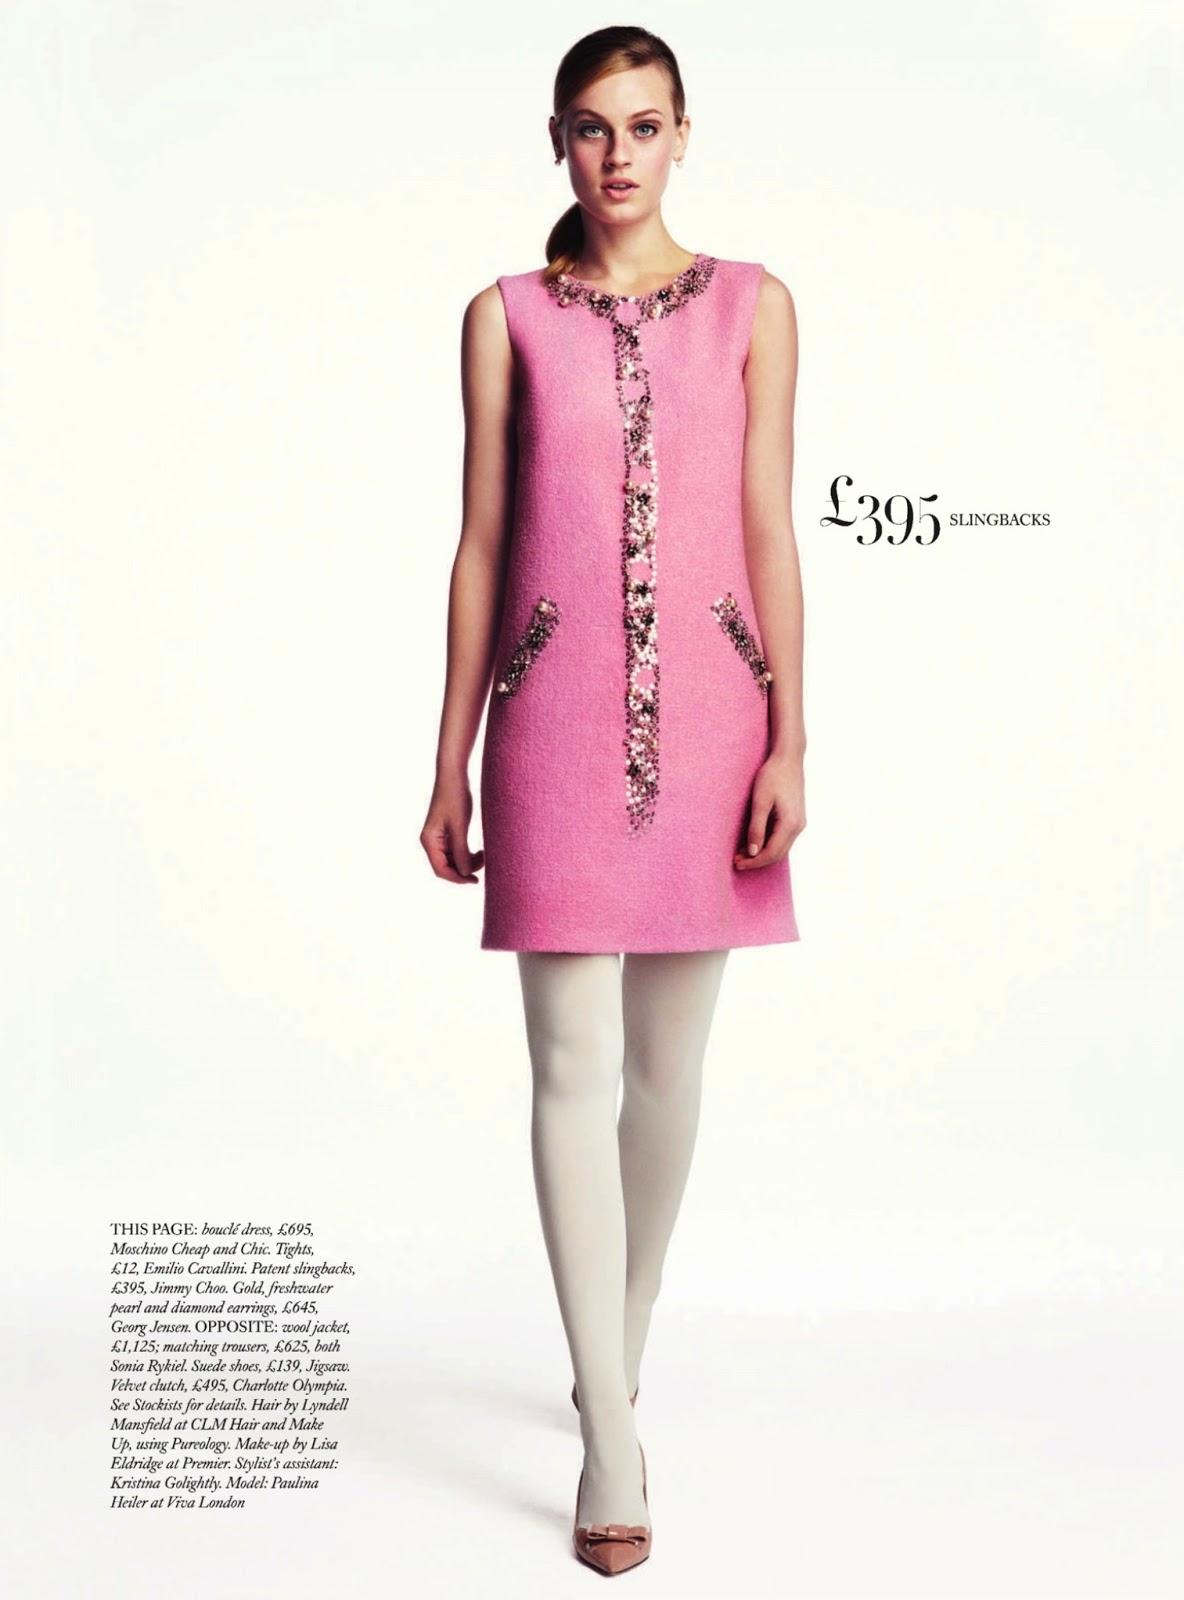 Pretty in pink Paulina Heiler By Dima Hohlov for Uk Harper's Bazaar6